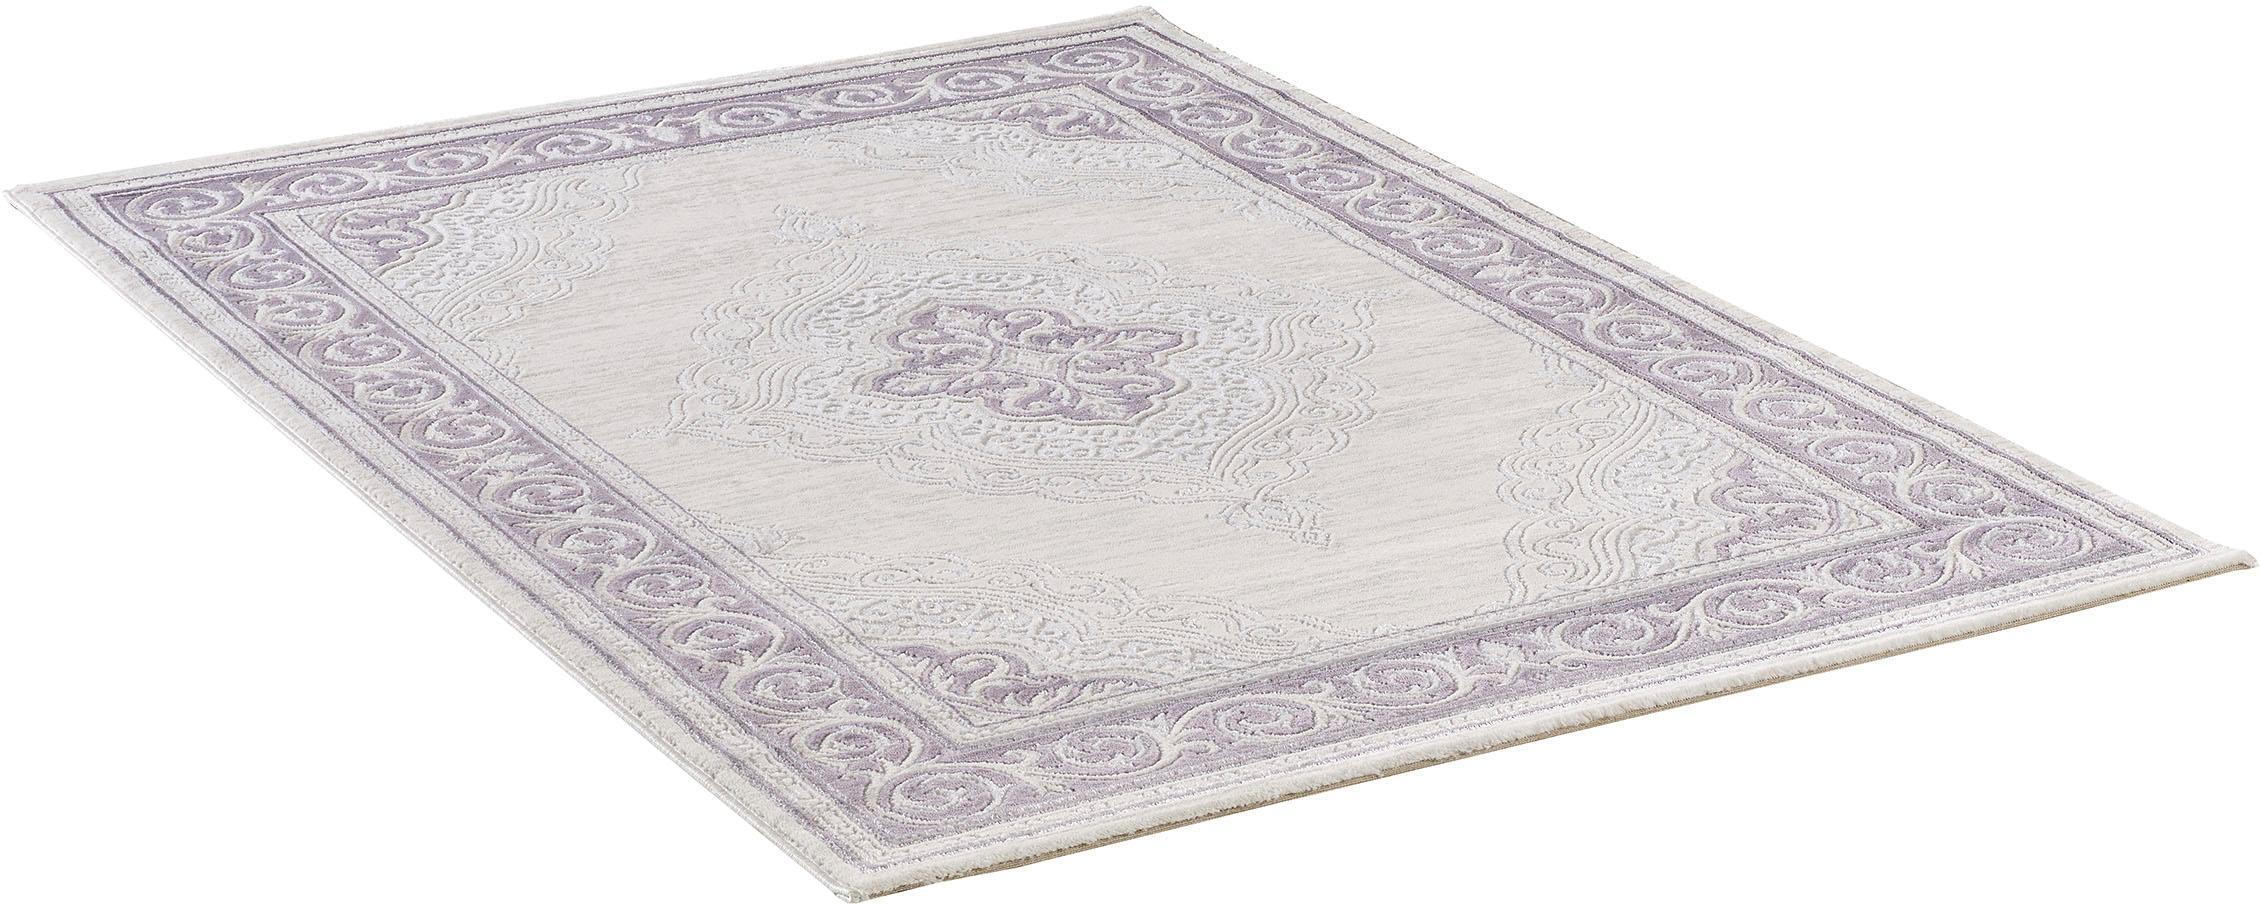 Teppich Harmony 3201 Sanat Teppiche rechteckig Höhe 12 mm maschinell gewebt